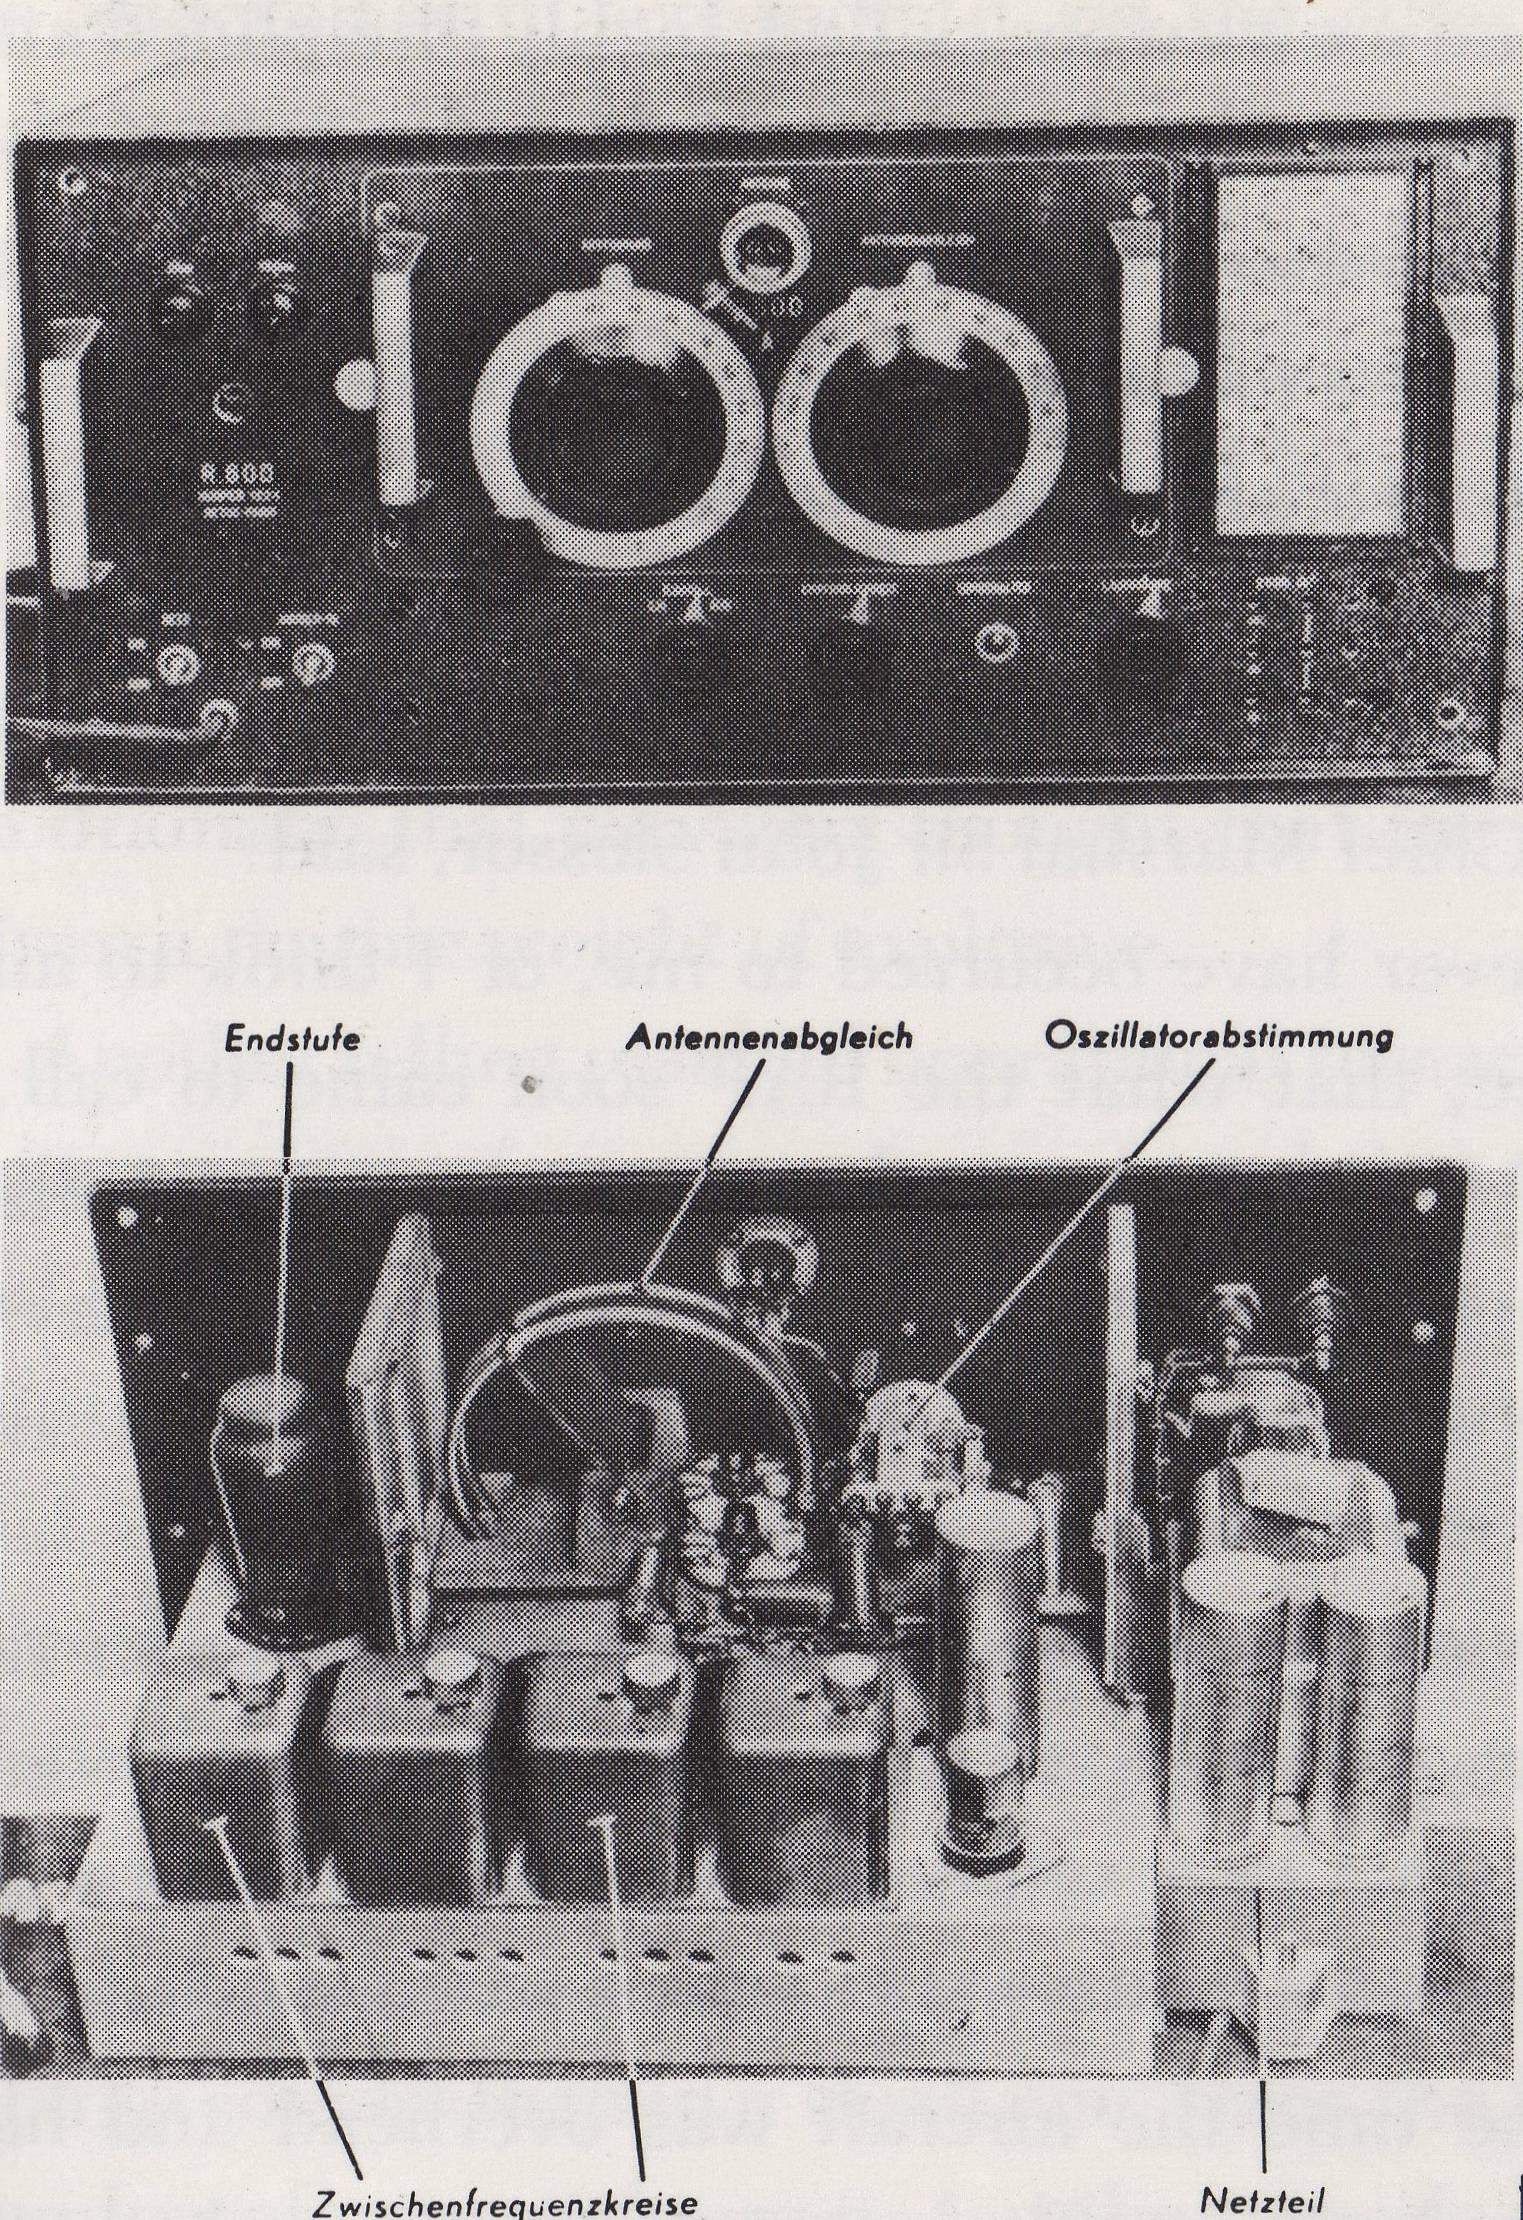 U-boat Radar Warning Receivers